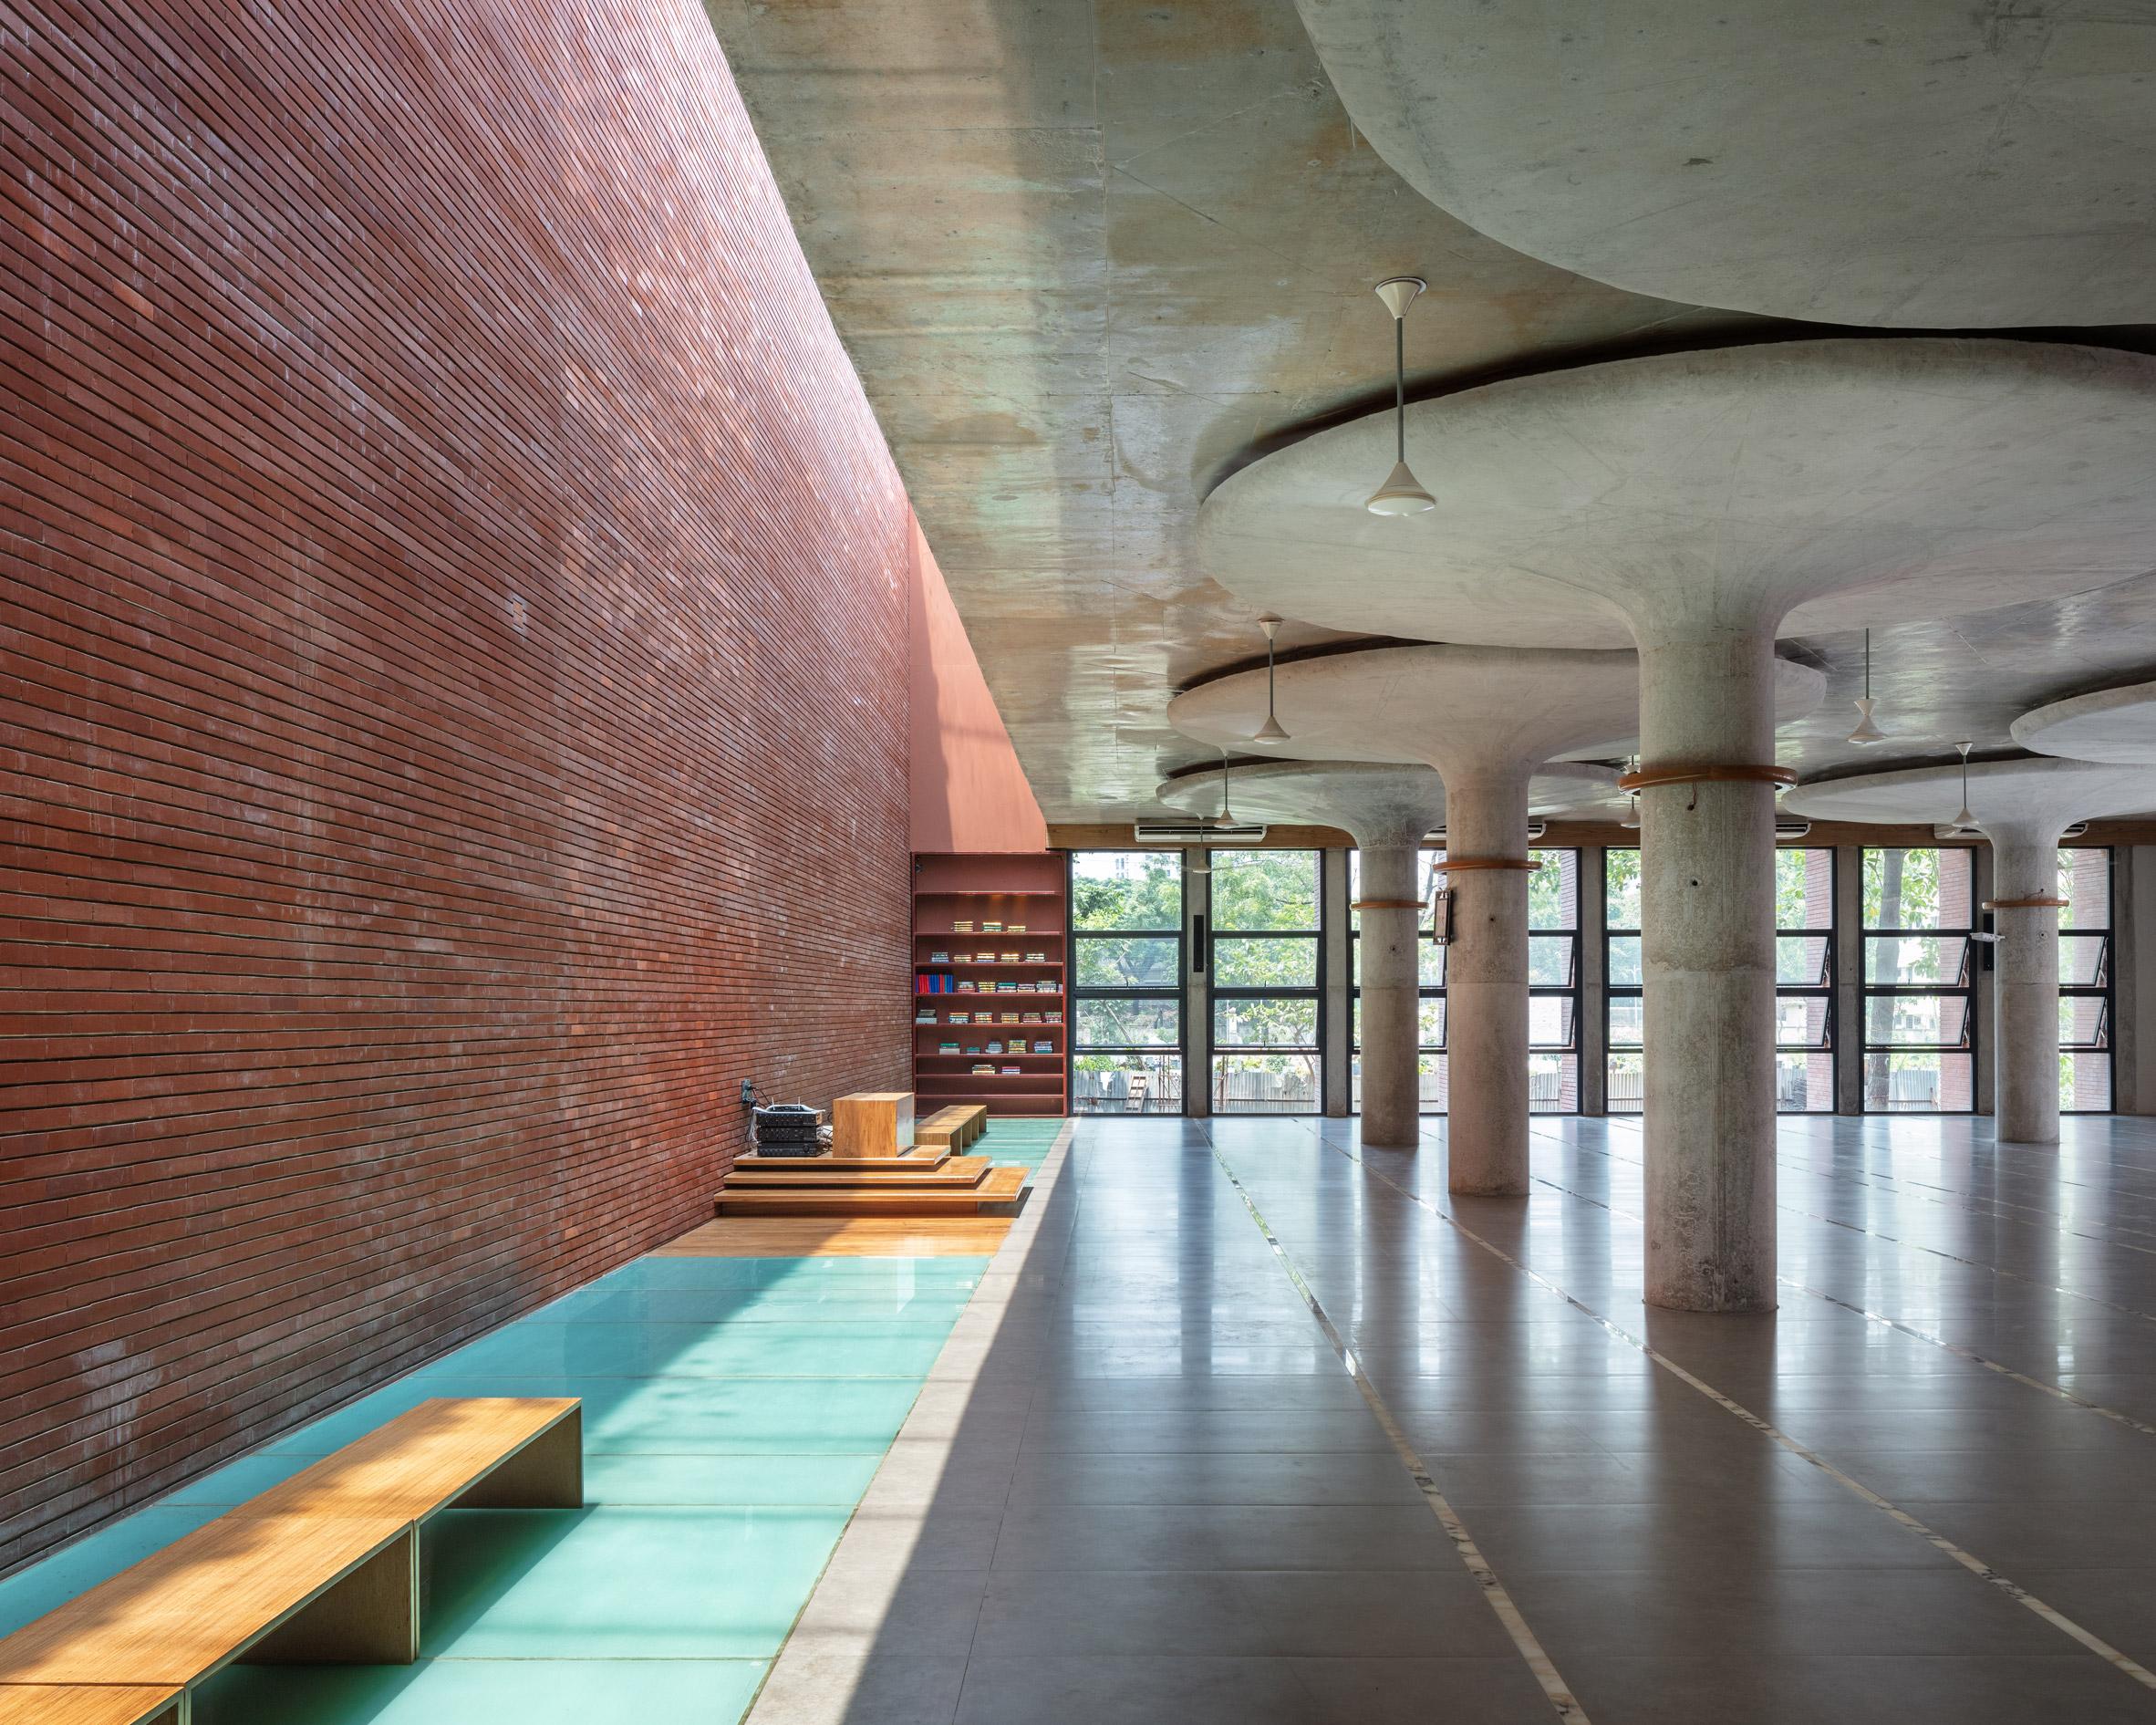 Mushroom-shaped concrete columns in prayer room